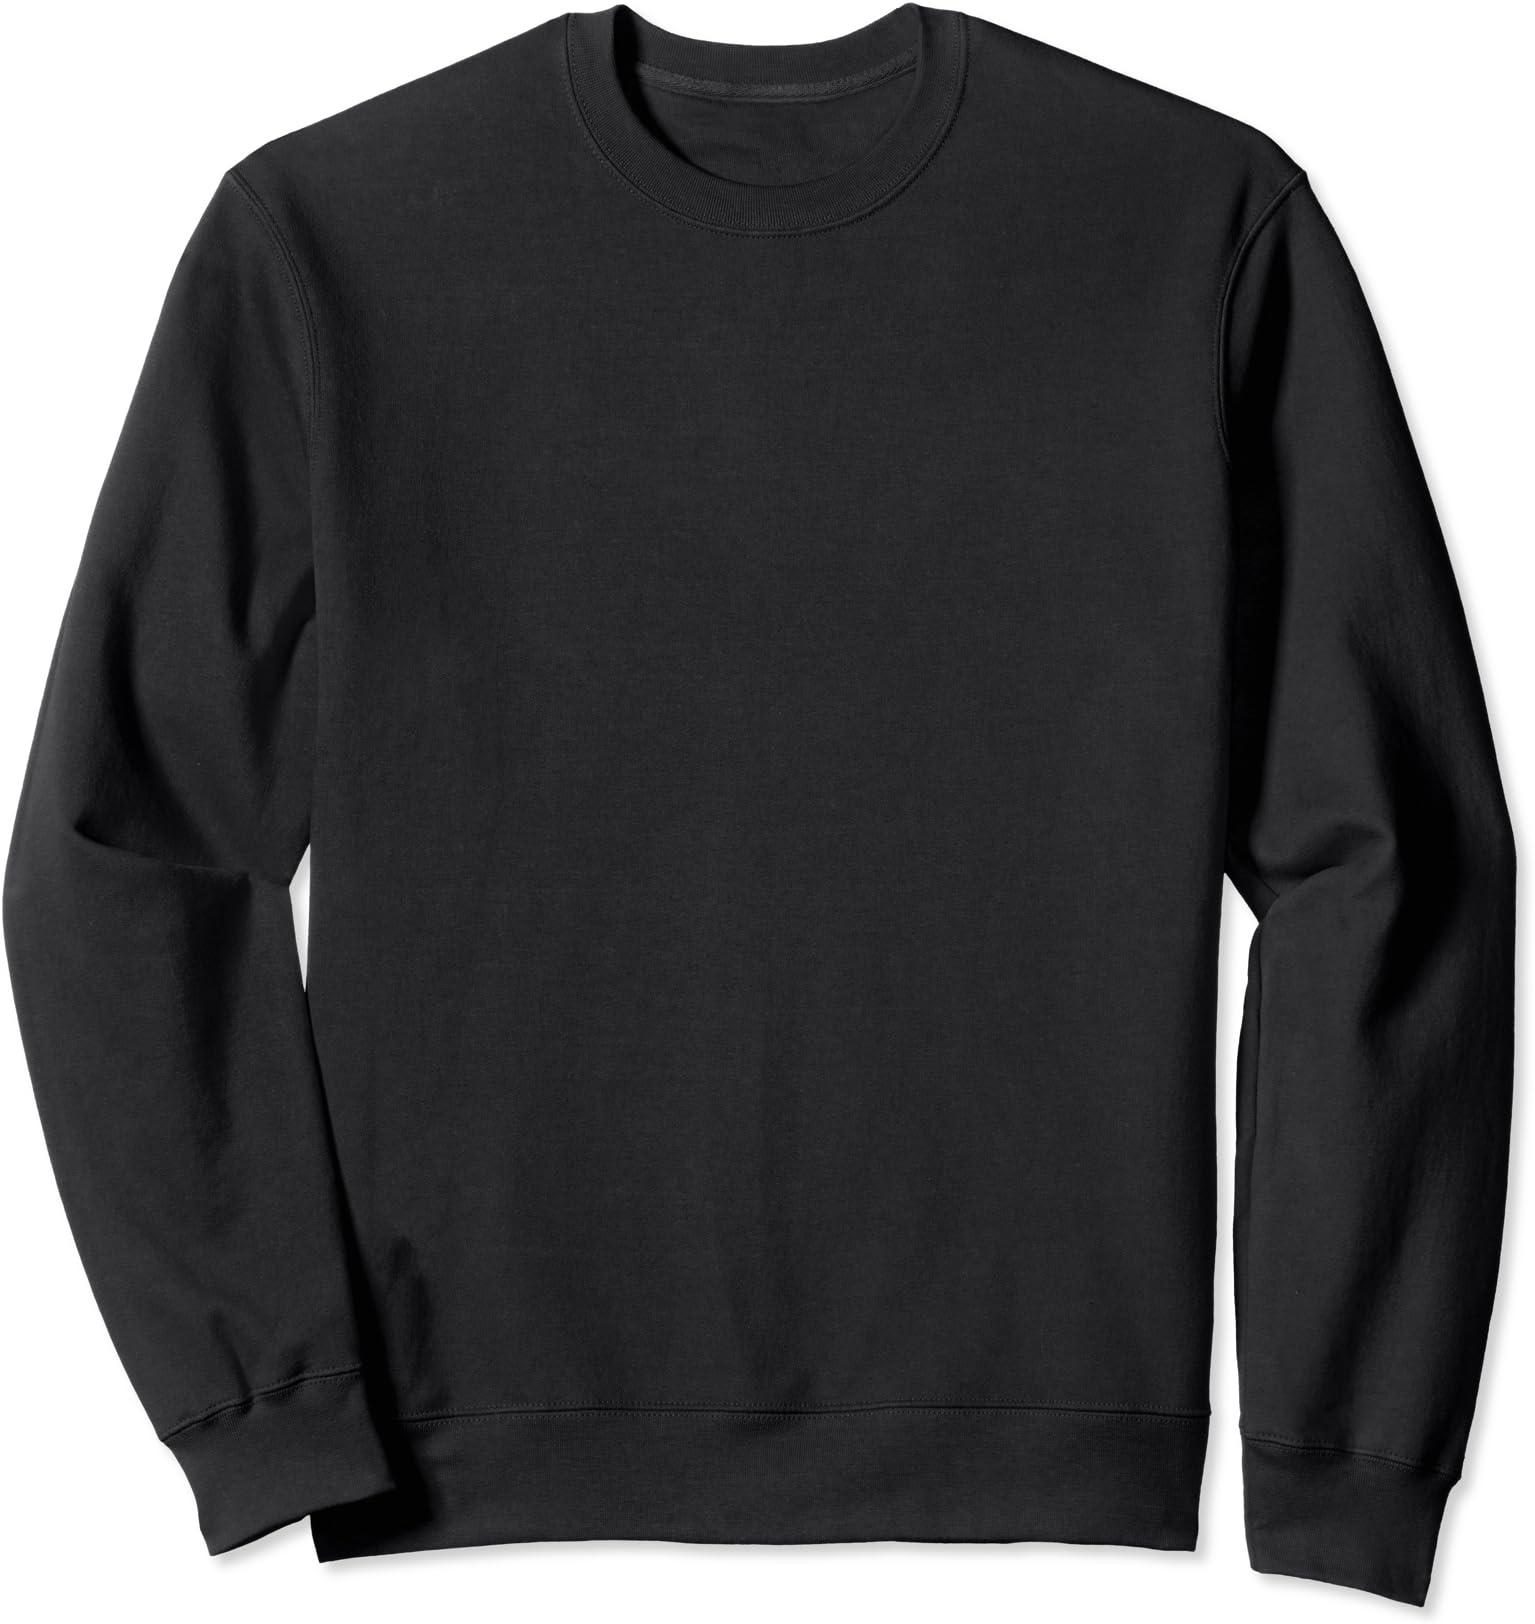 Portland Oregon Printed Sleeves Crewneck Sweatshirt